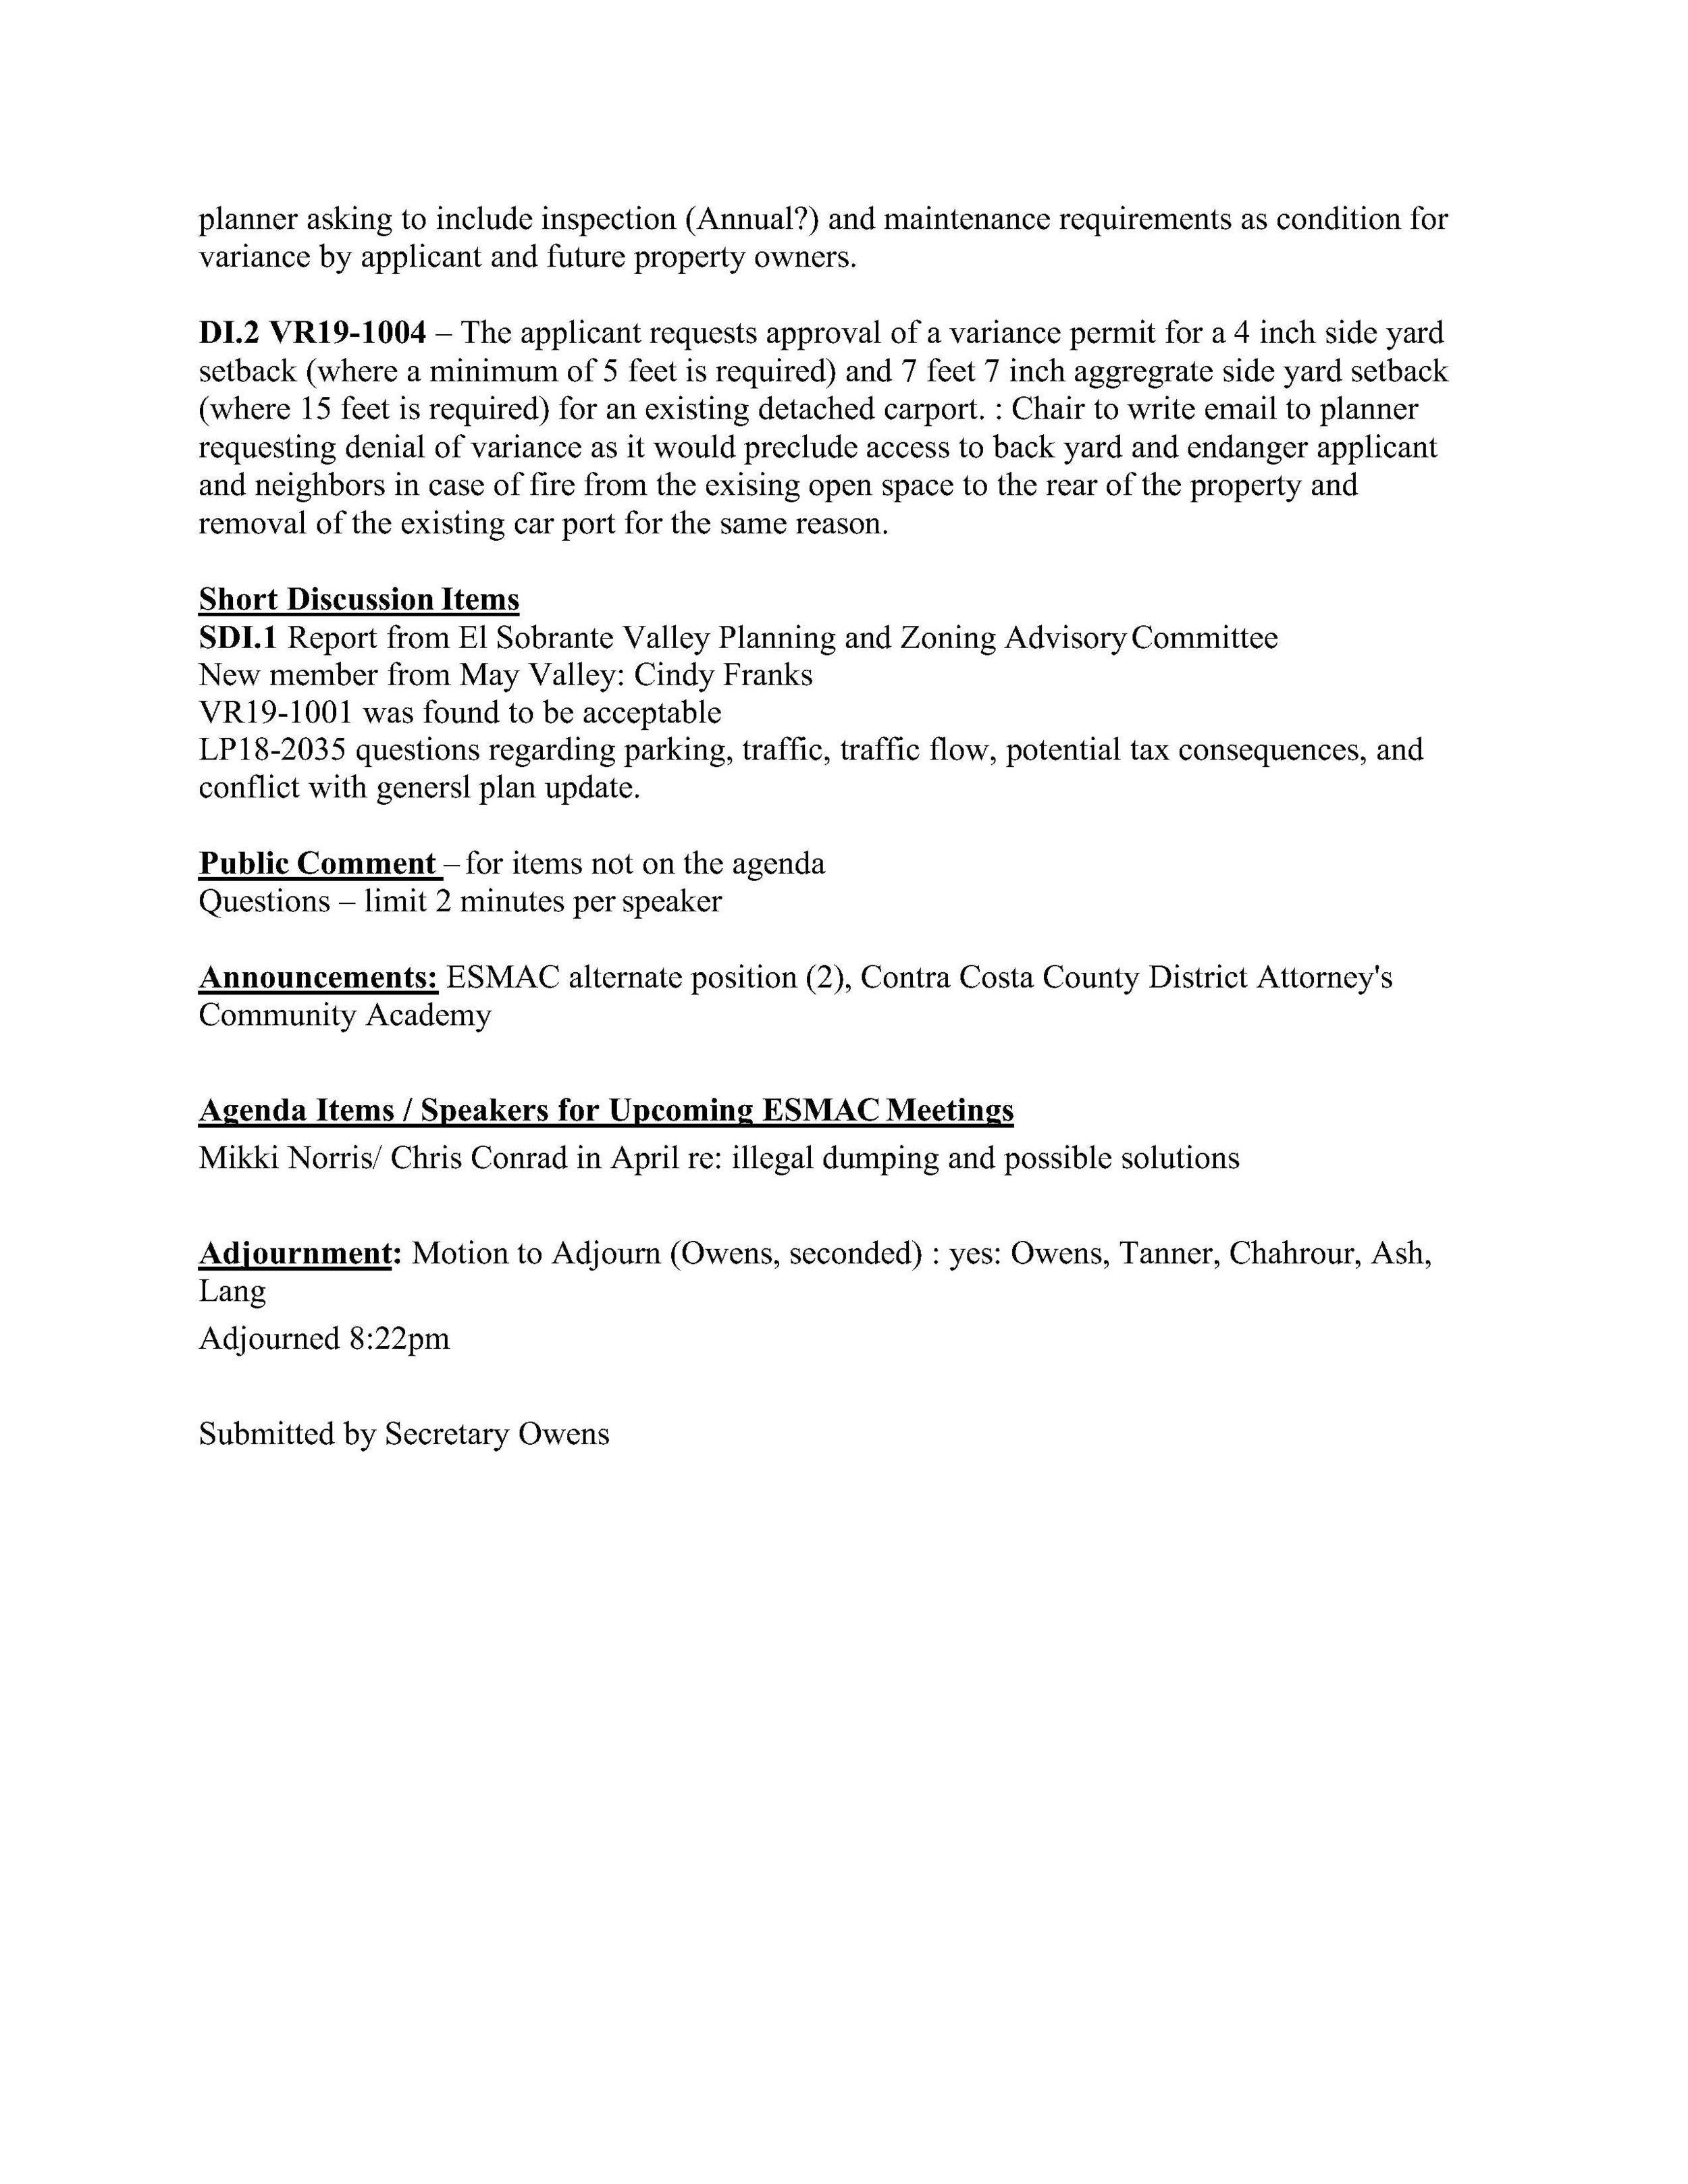 ESMAC Agenda 3.13.2019 (8 Pages)_4.jpg